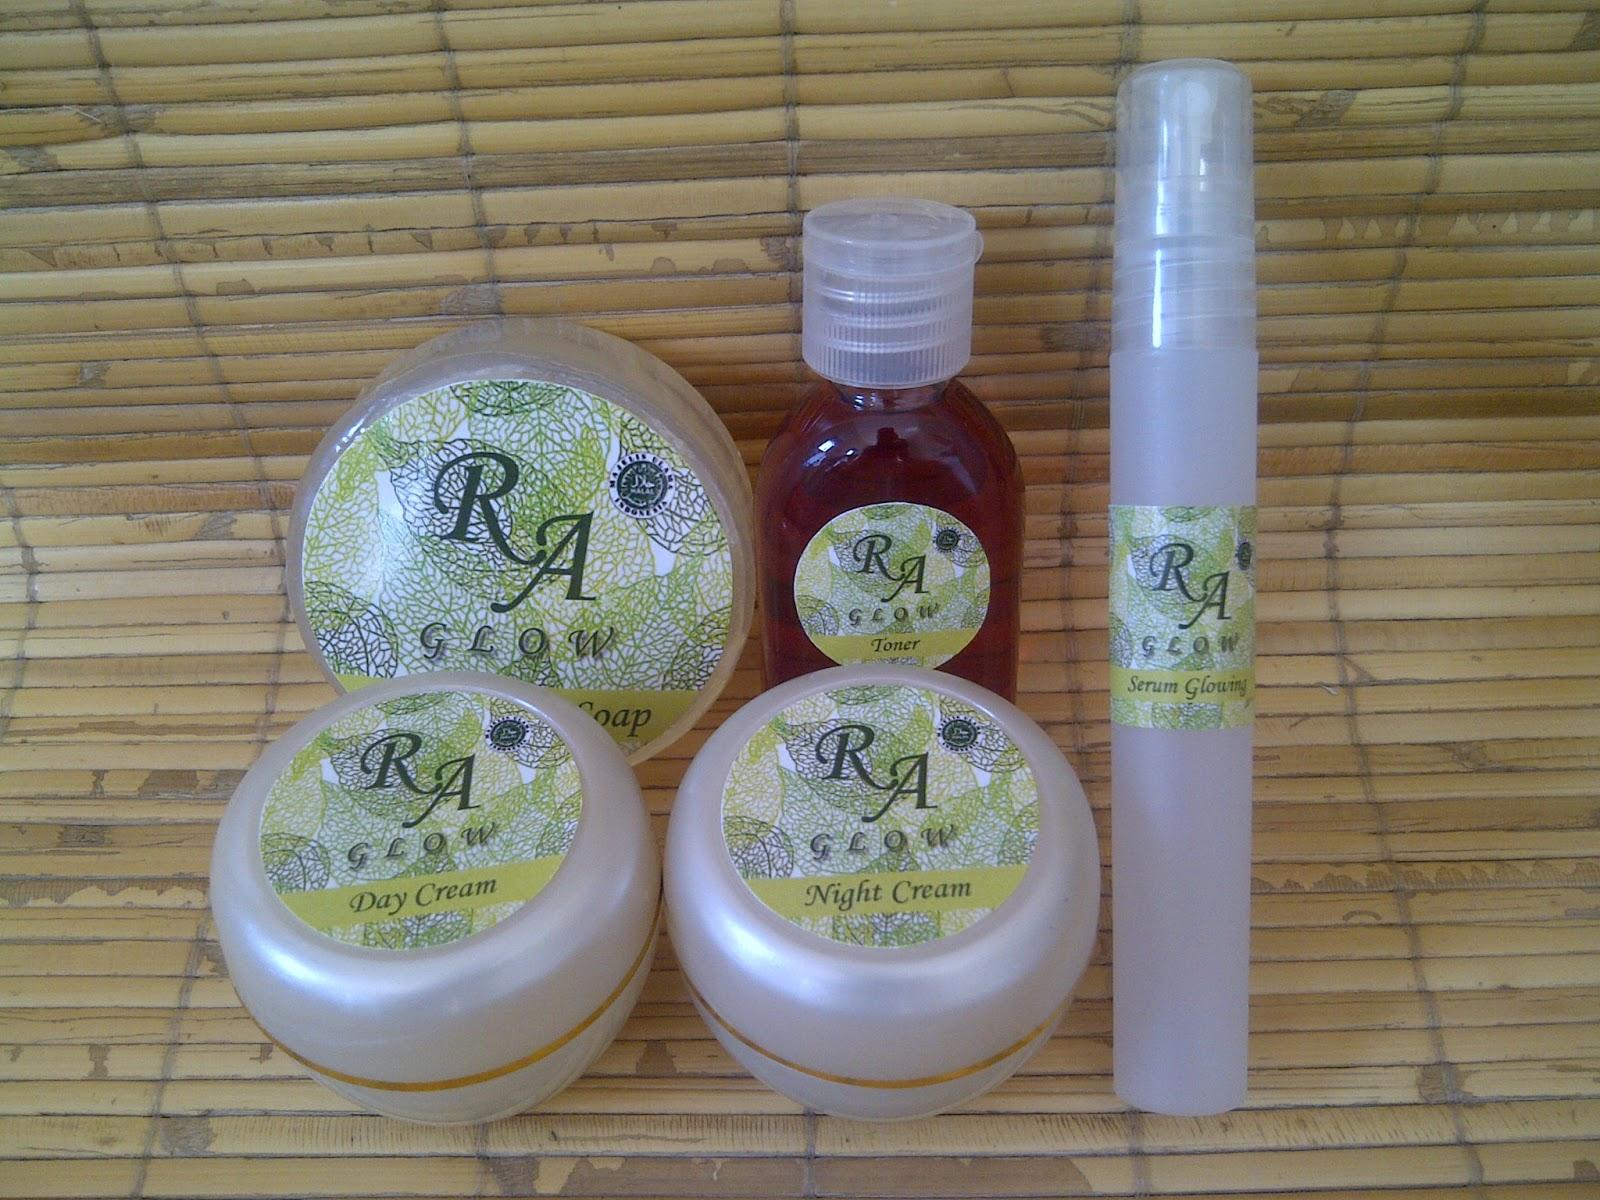 Distributor Resmi Cream Ra Glow Original Agen Murah Paket Acne Whitening Sudah Diracik Dan Diformulakan Sebagai Perawatan Multifungsi Sehingga Dapat Digunakan Untuk Semua Jenis Kulit Seperti Kering